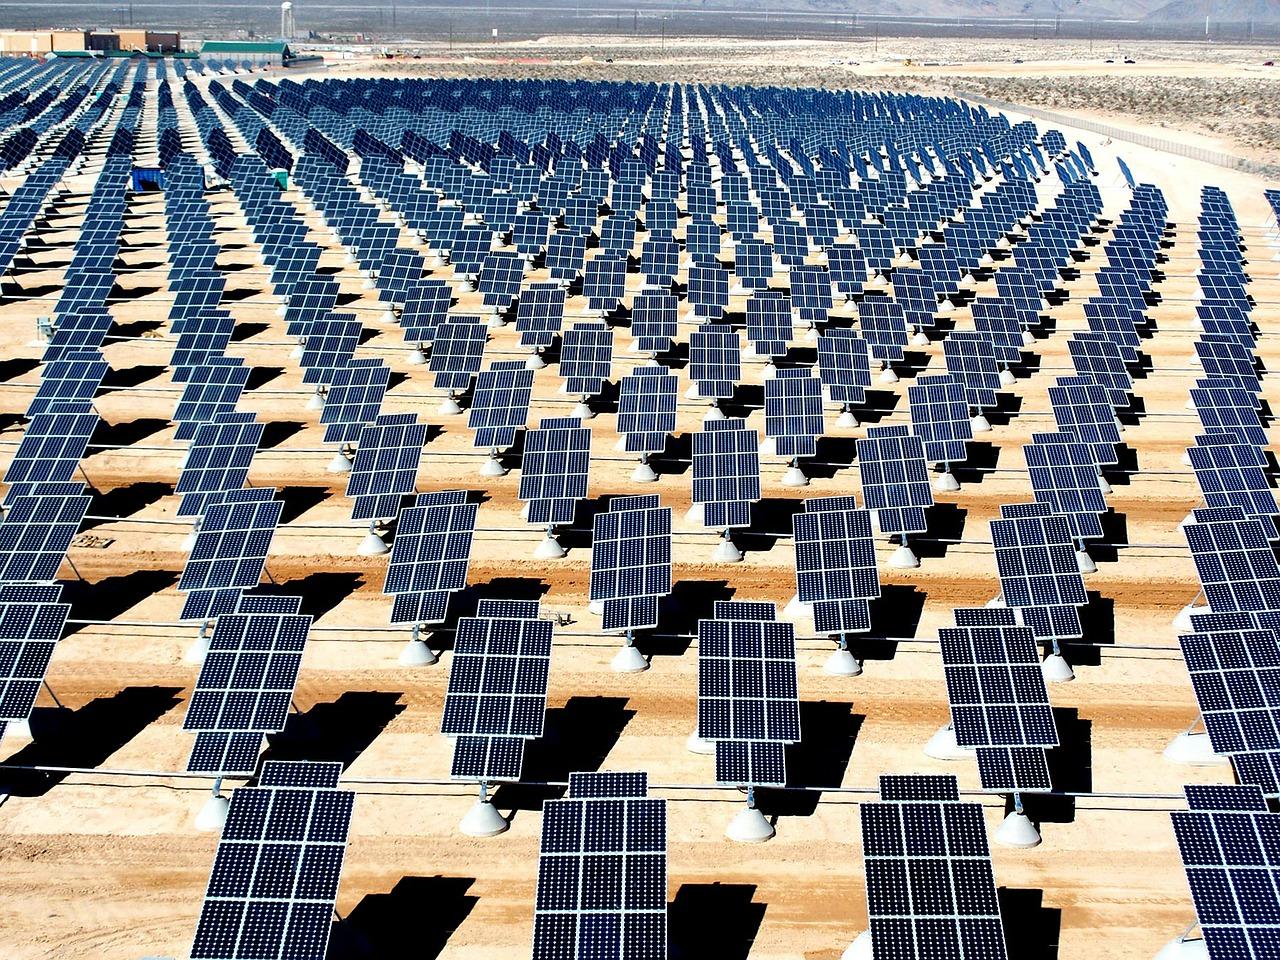 AleaSoft - Planta fotovoltaica arreglo paneles solares